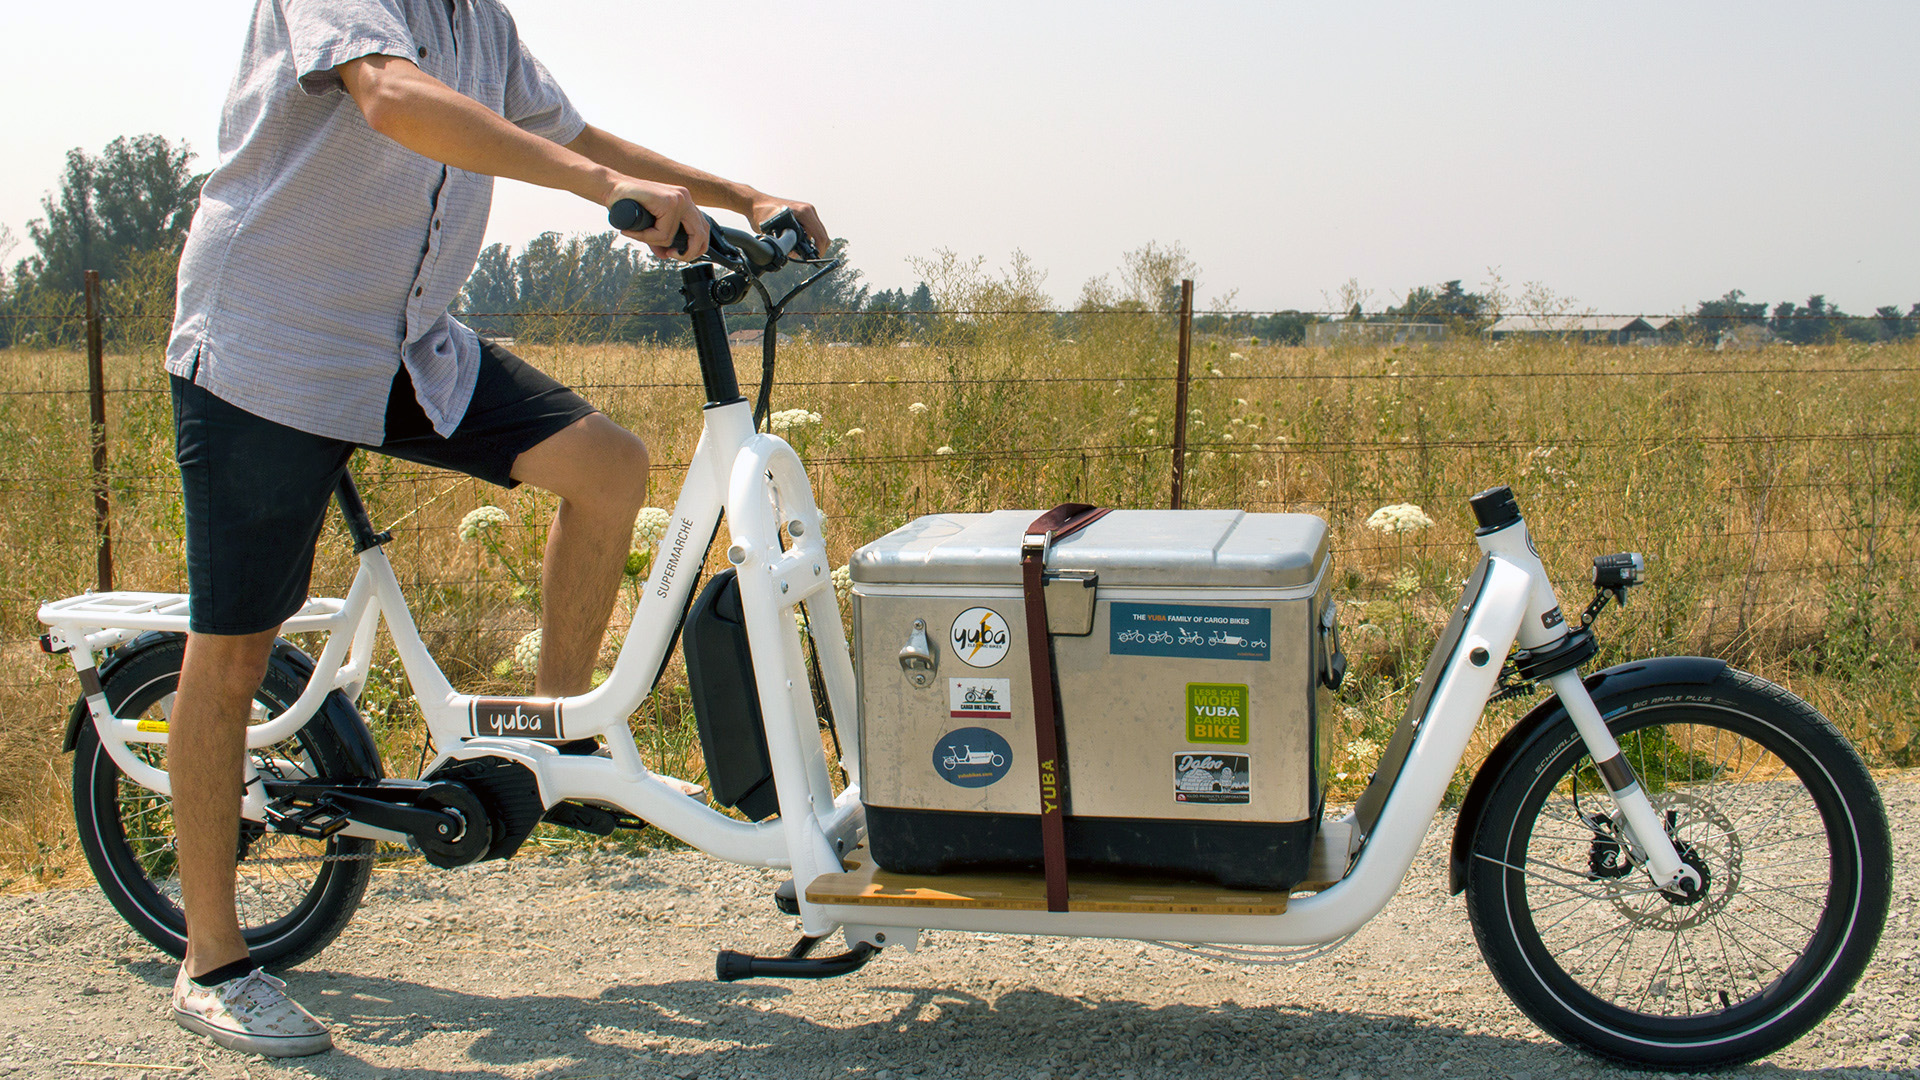 Yuba Electric Supermarche front loading cargo bike